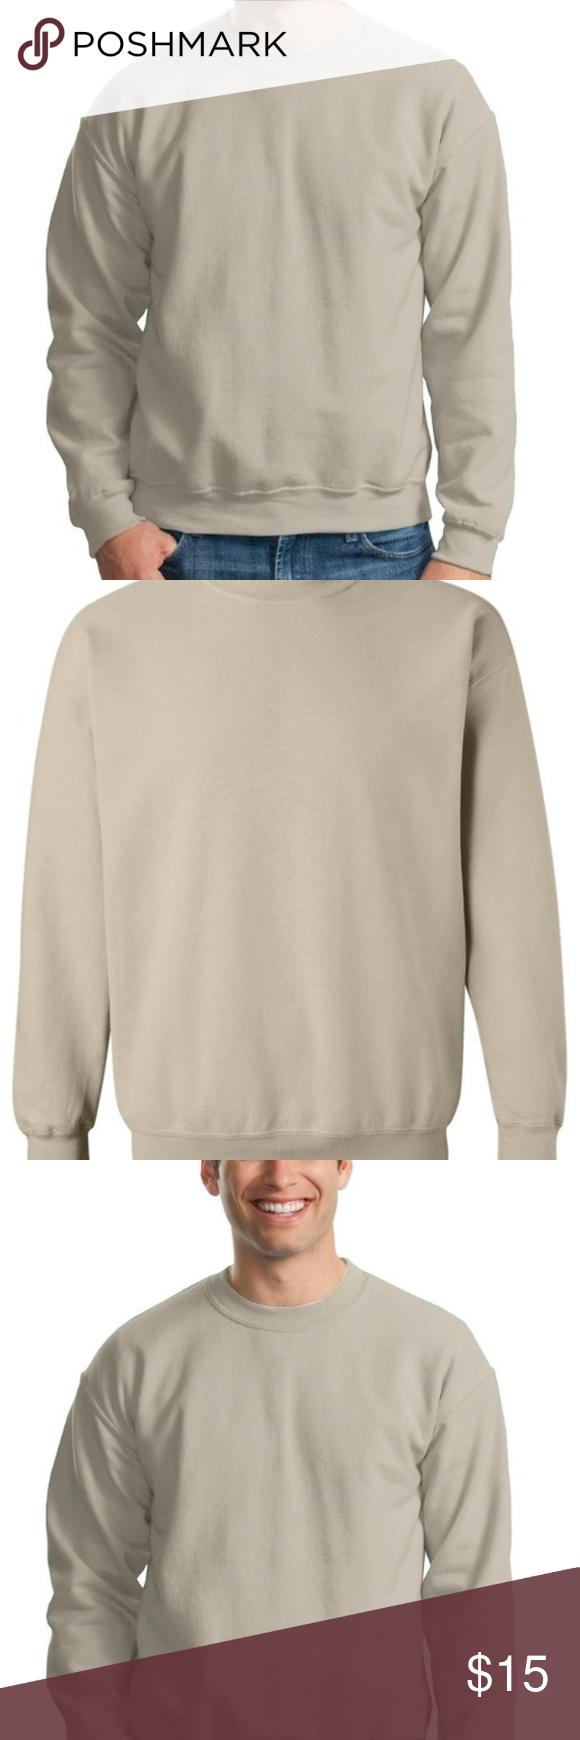 Tan Sweatshirt By Gildan Size Xl New Nwt Clothes Design Sweatshirts Fashion [ 1740 x 580 Pixel ]